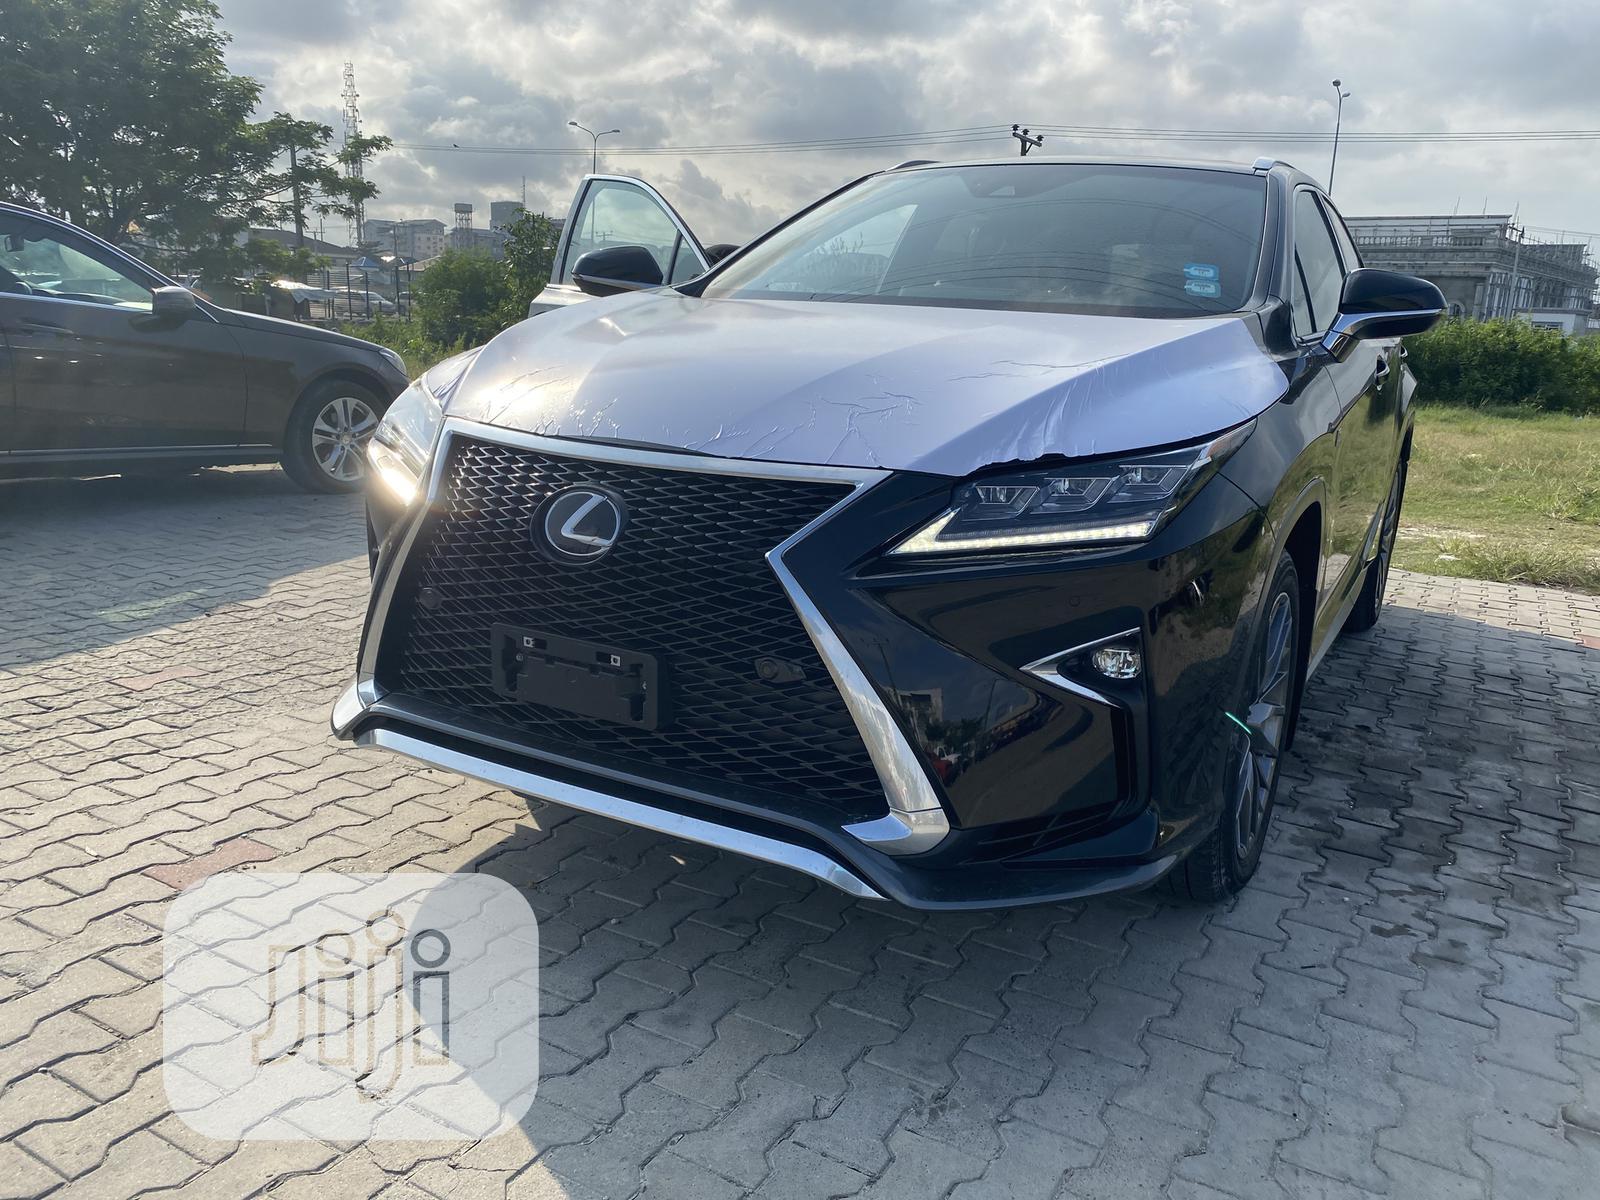 New Lexus RX 2019 Black